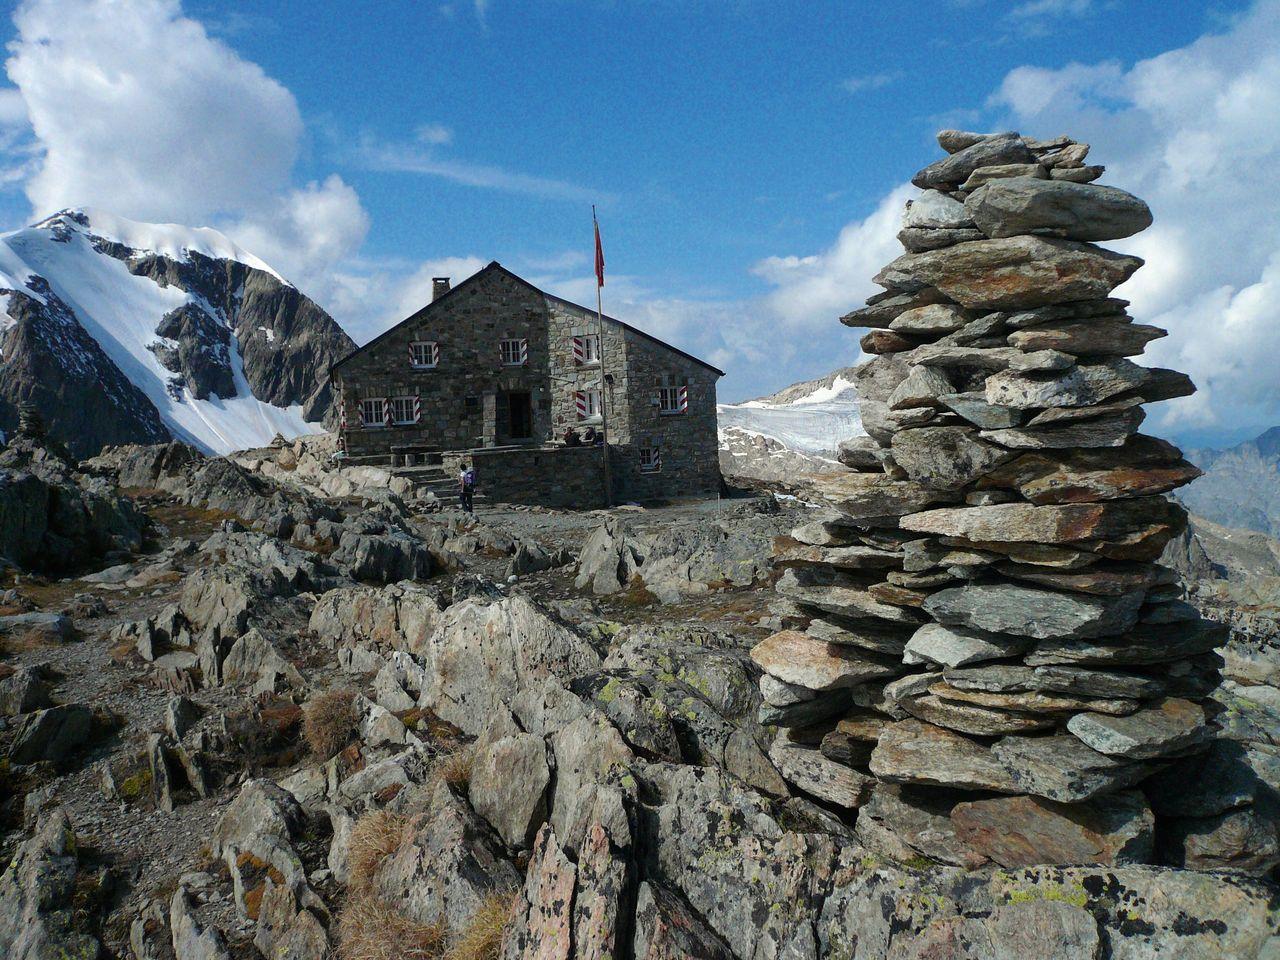 Klettersteig Tierbergli : Tierbergli klettersteig klettersteige tierberglihütte sac